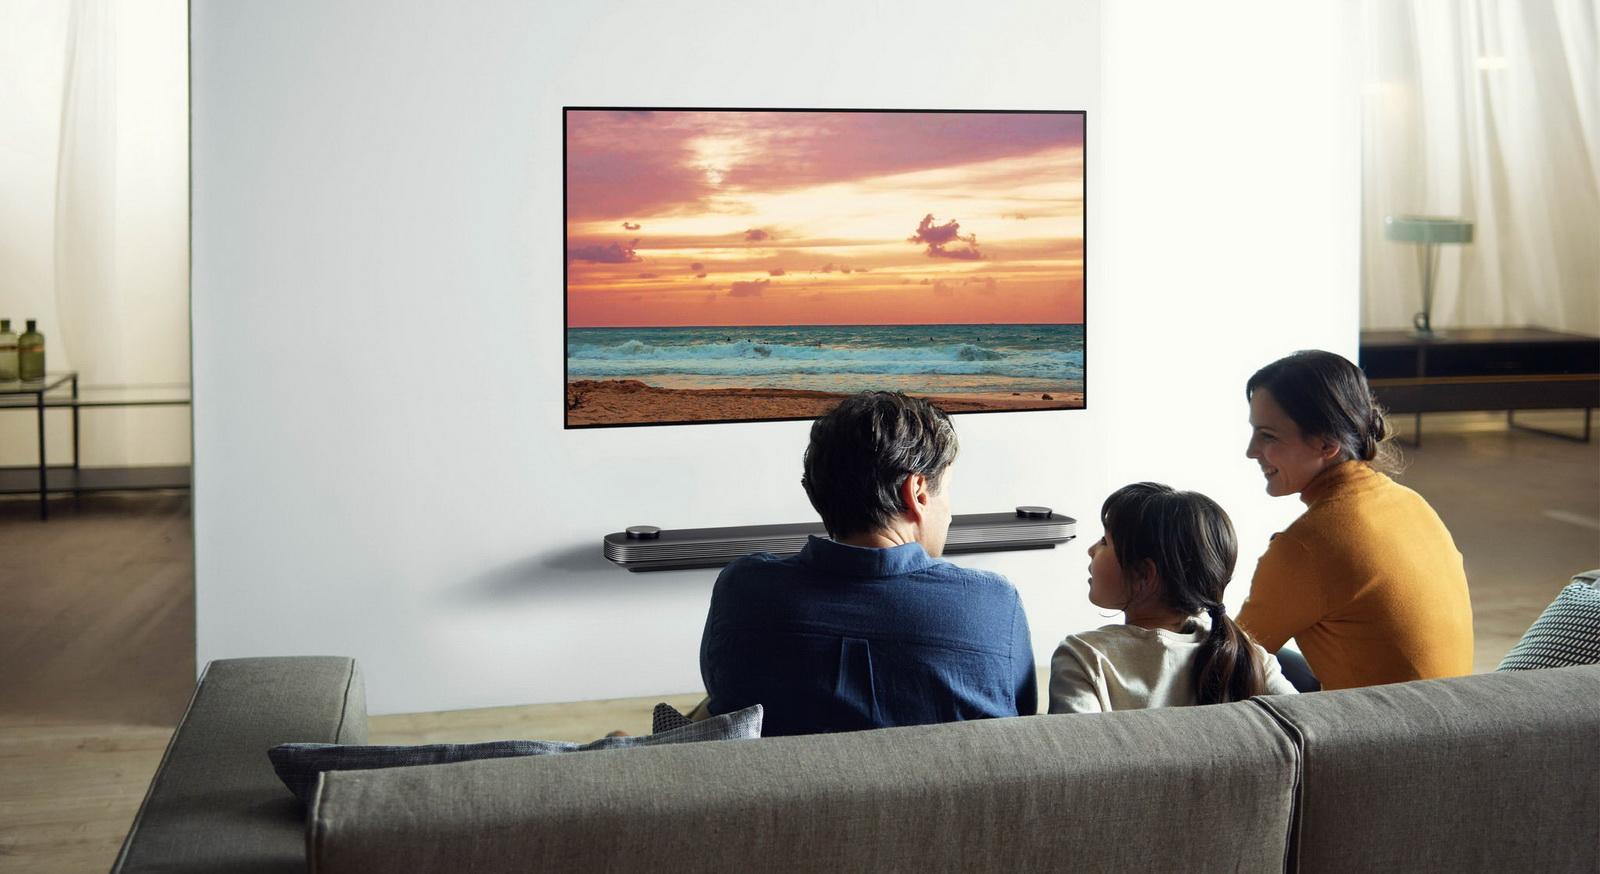 LG_SIGNATURE_OLED_W7_TV_2